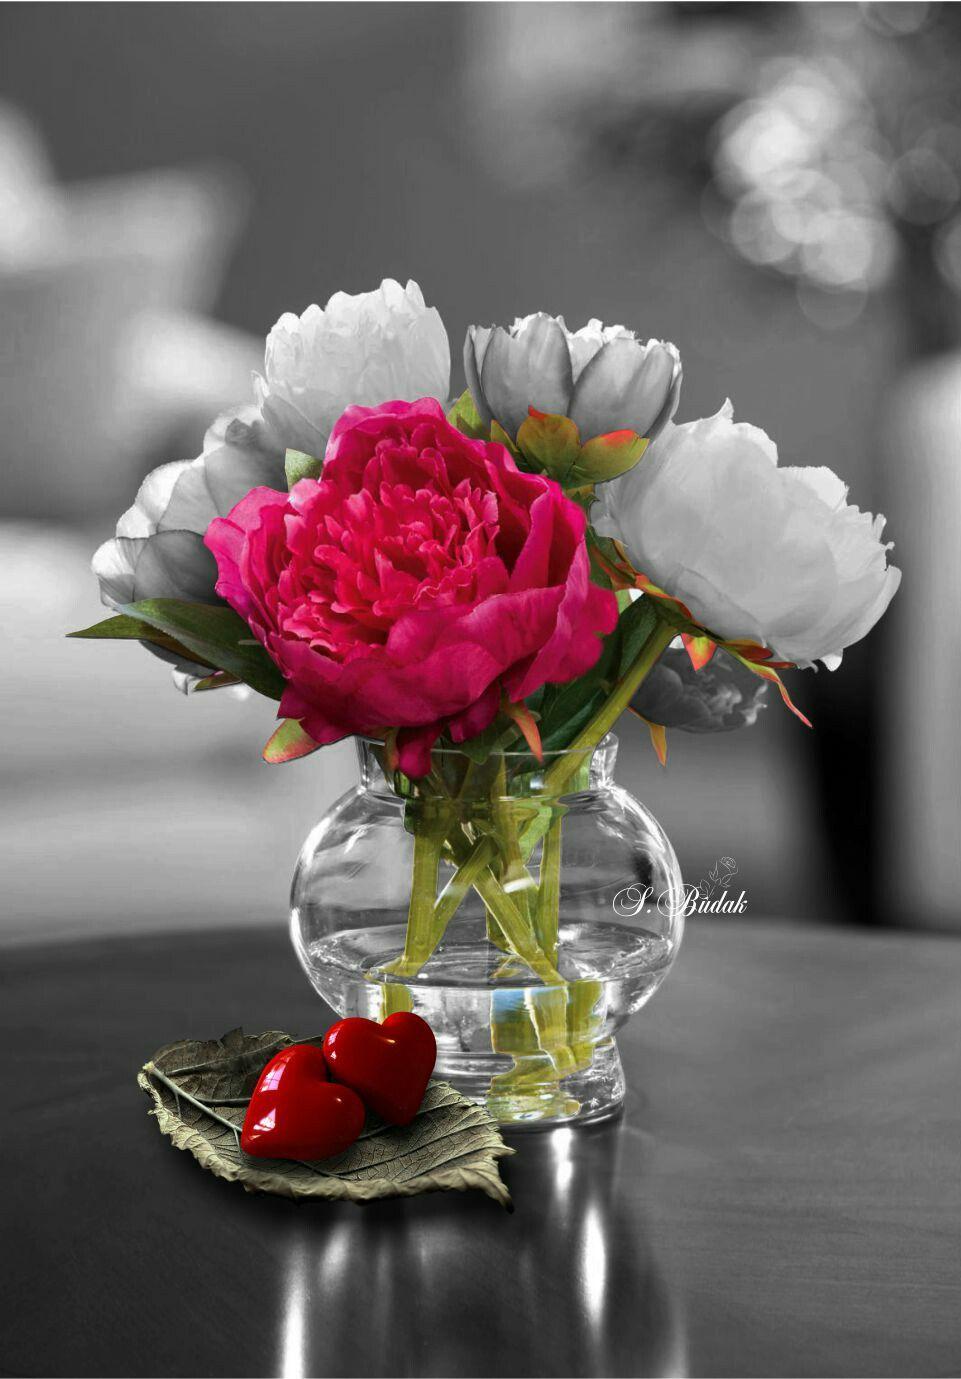 Color Splash flowers with red hearts | جمال | Pinterest | Colour ...